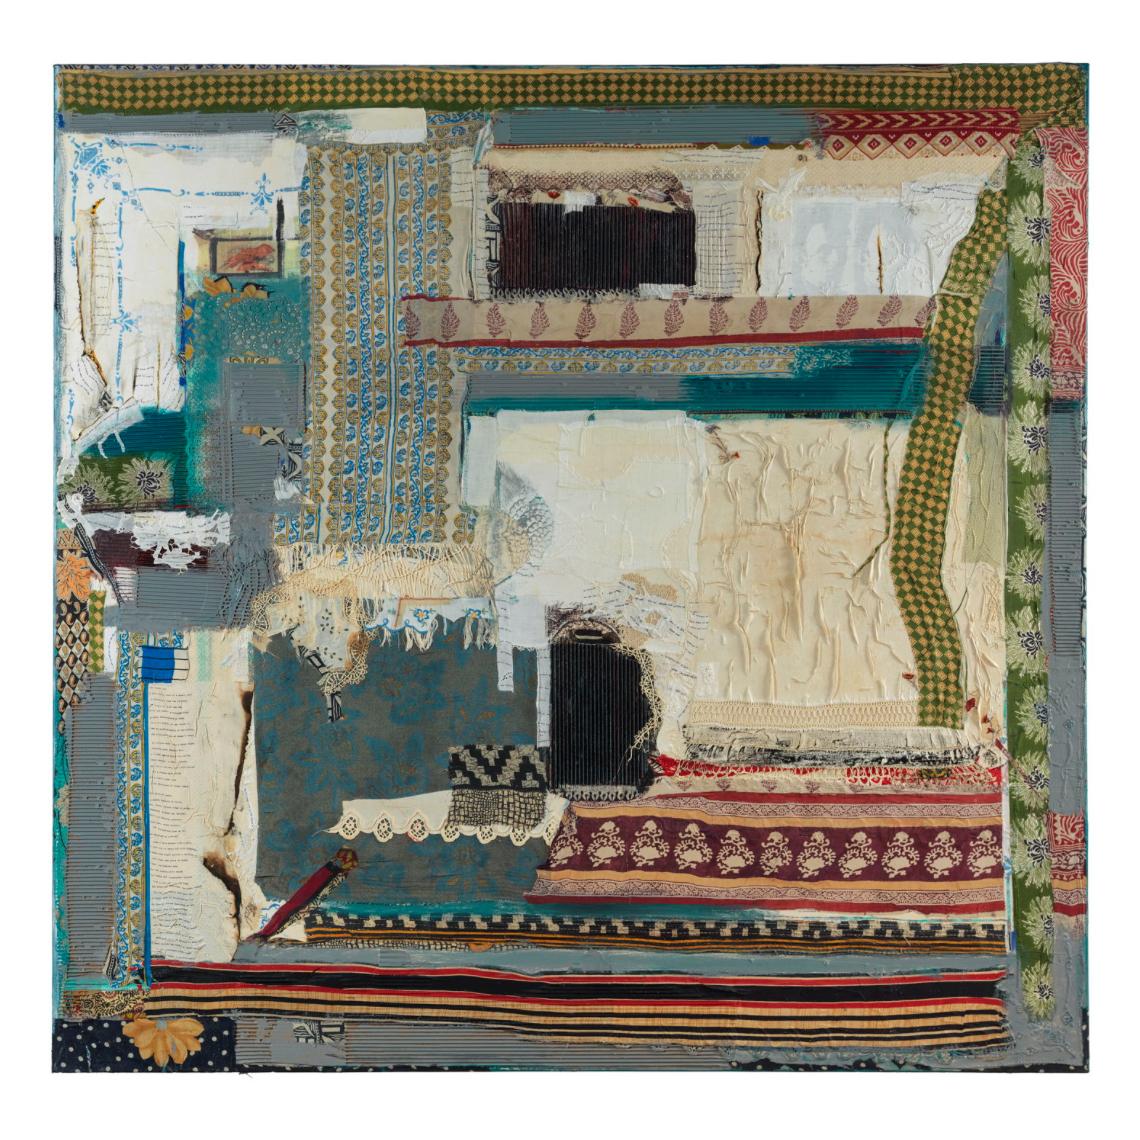 Peter Sacks, Township 5, 2014-2016 Mixed media © Peter Sacks, courtesy Marlborough Gallery, New York